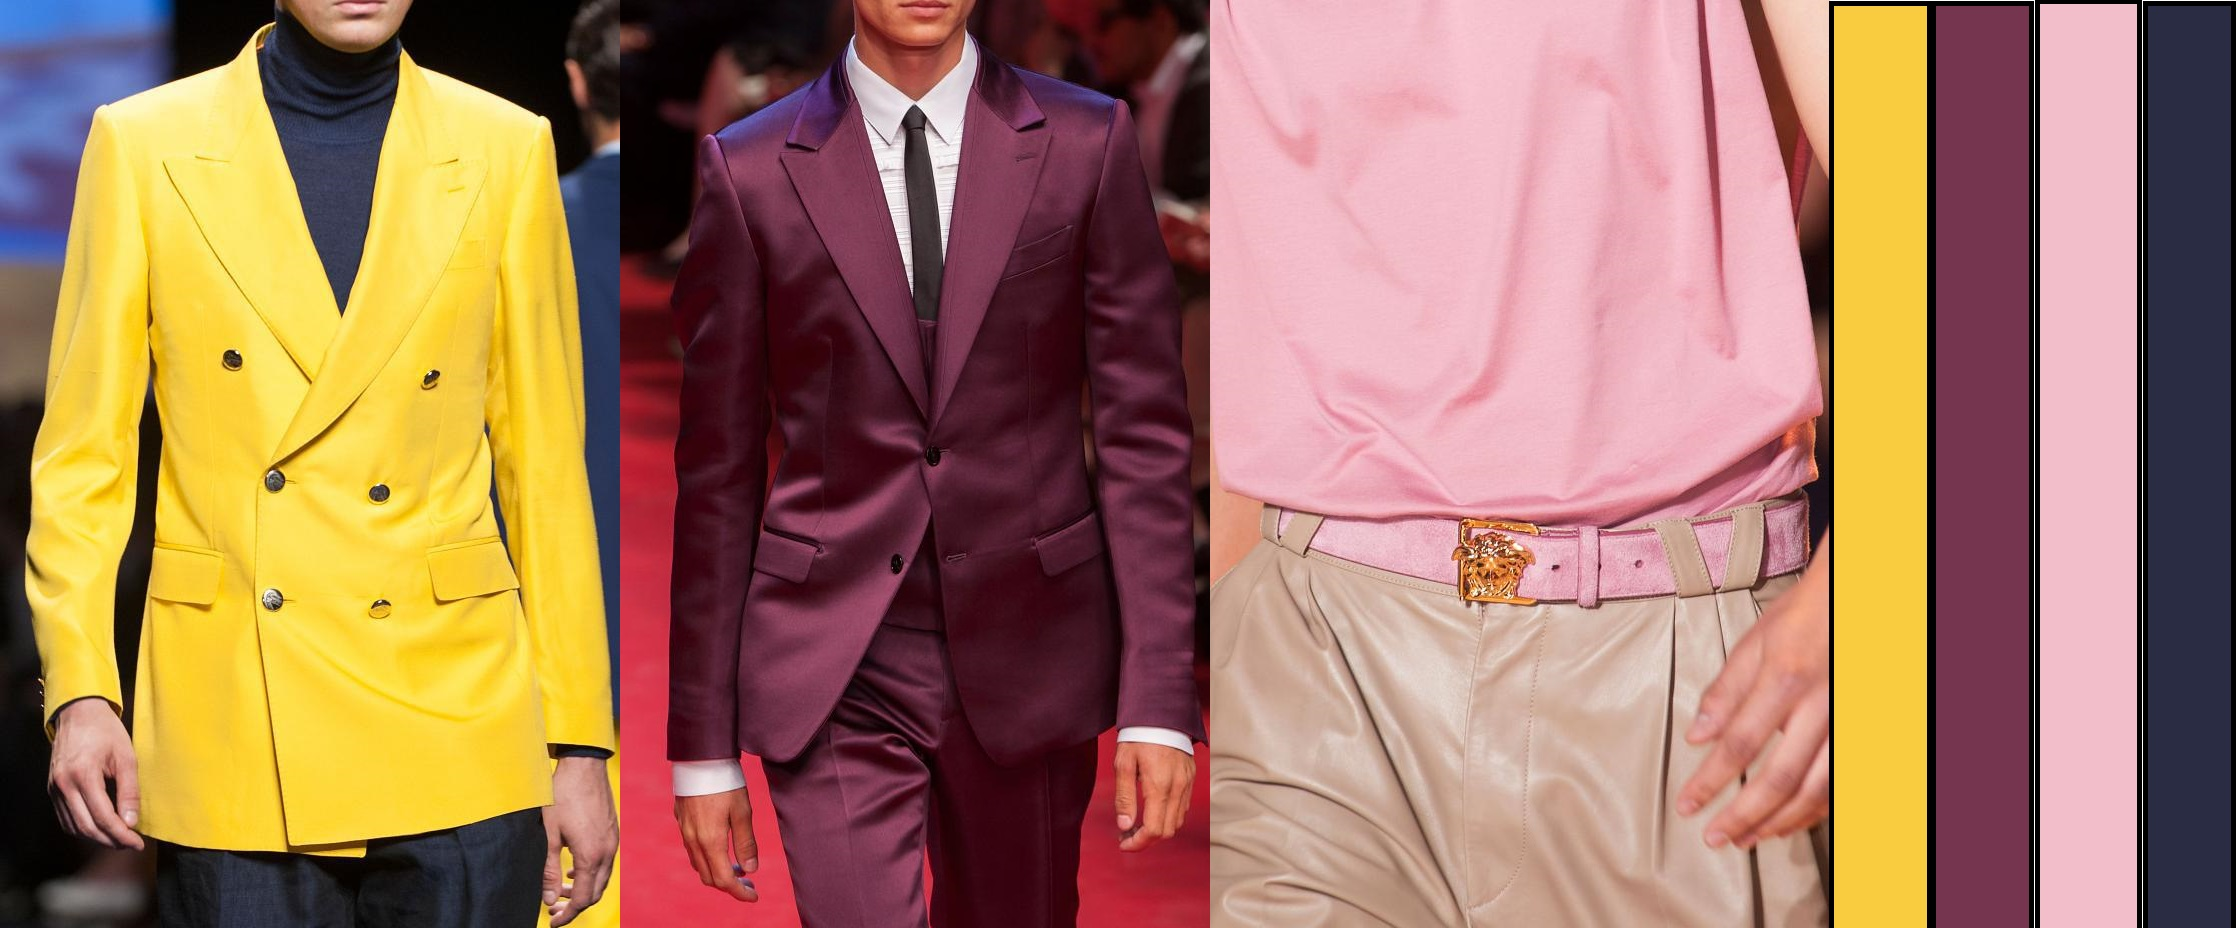 Milan, menswear, trends, personal shopper, image consultant, silk gift milan, man, style, fashion, shopping, trendy